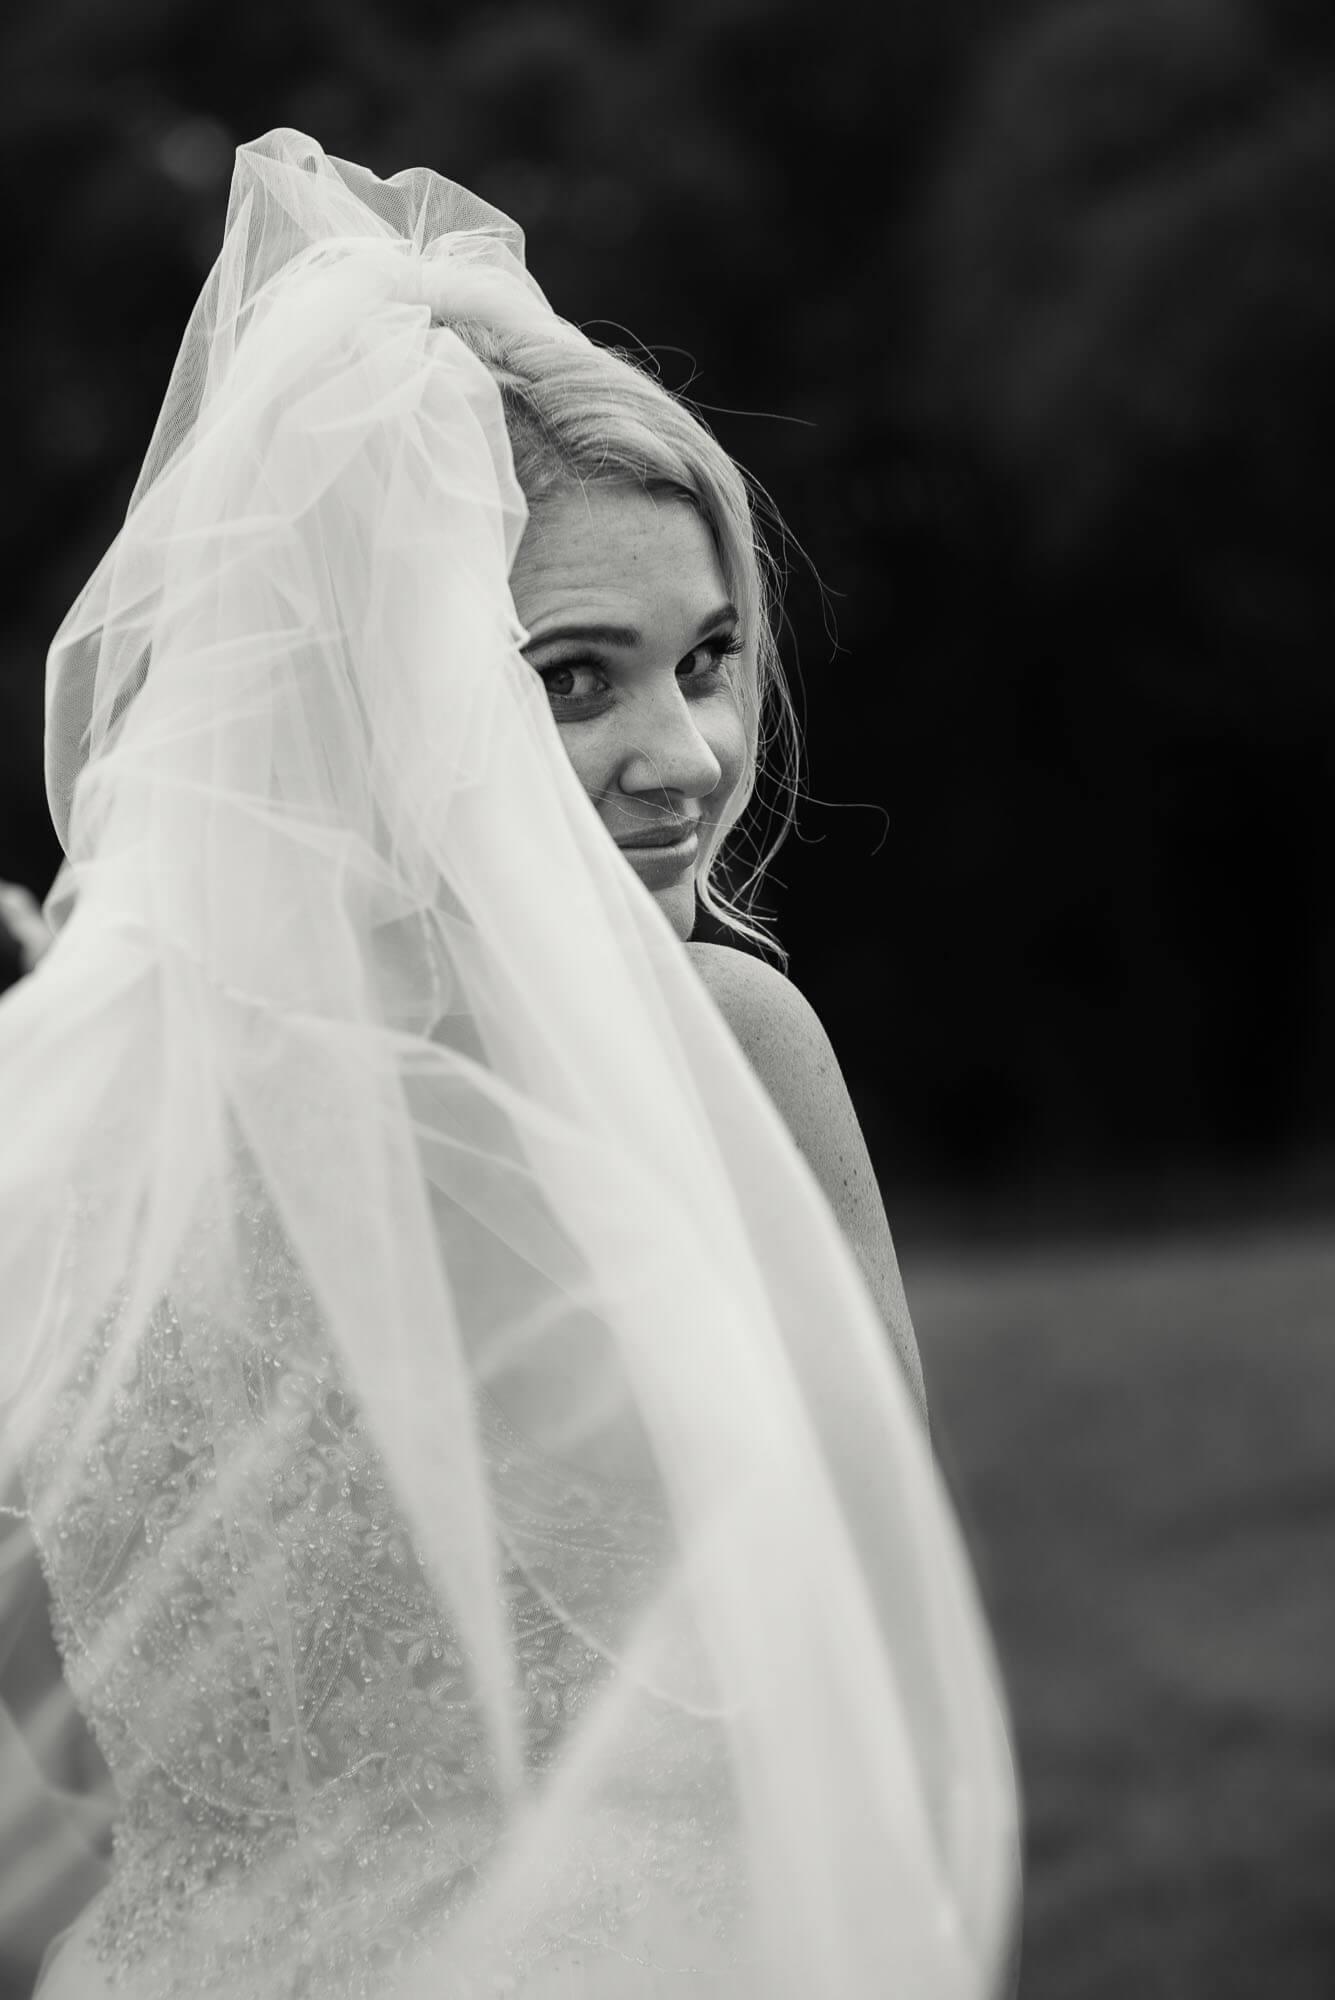 bride-looking-over-her-shoulder-black-and-white.jpg